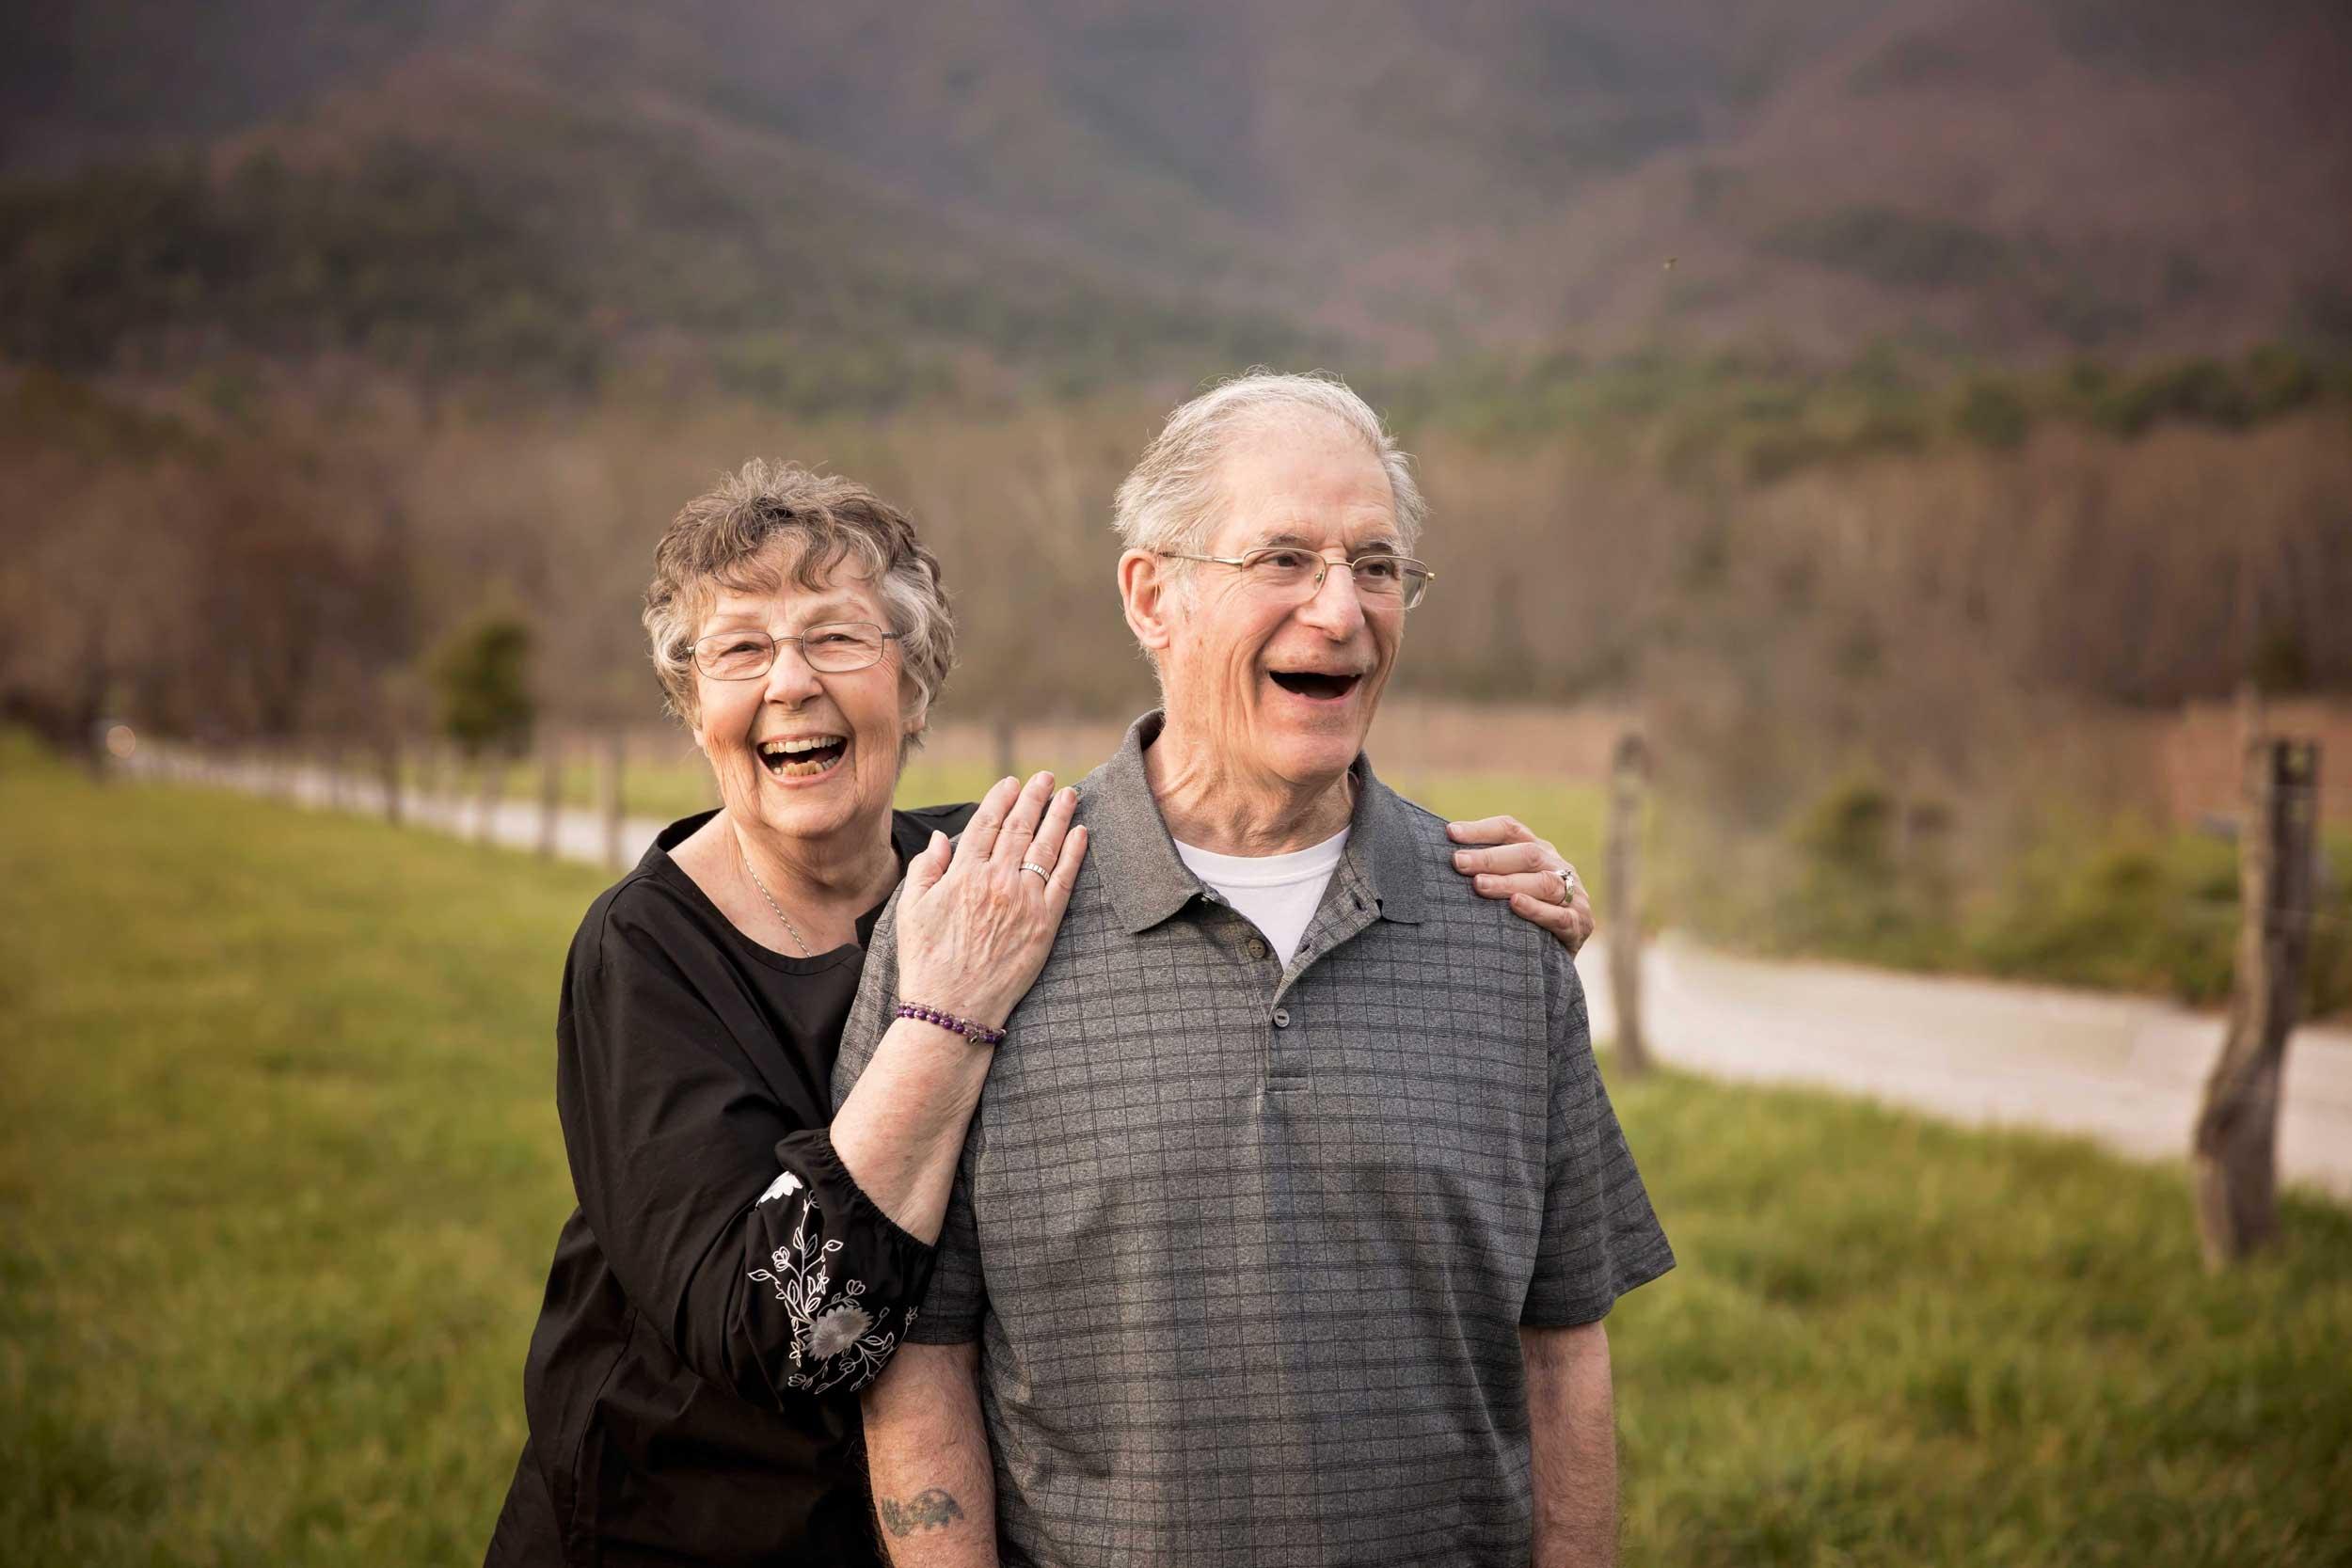 gatlinburg-photographer-couple-anniverasary.jpg